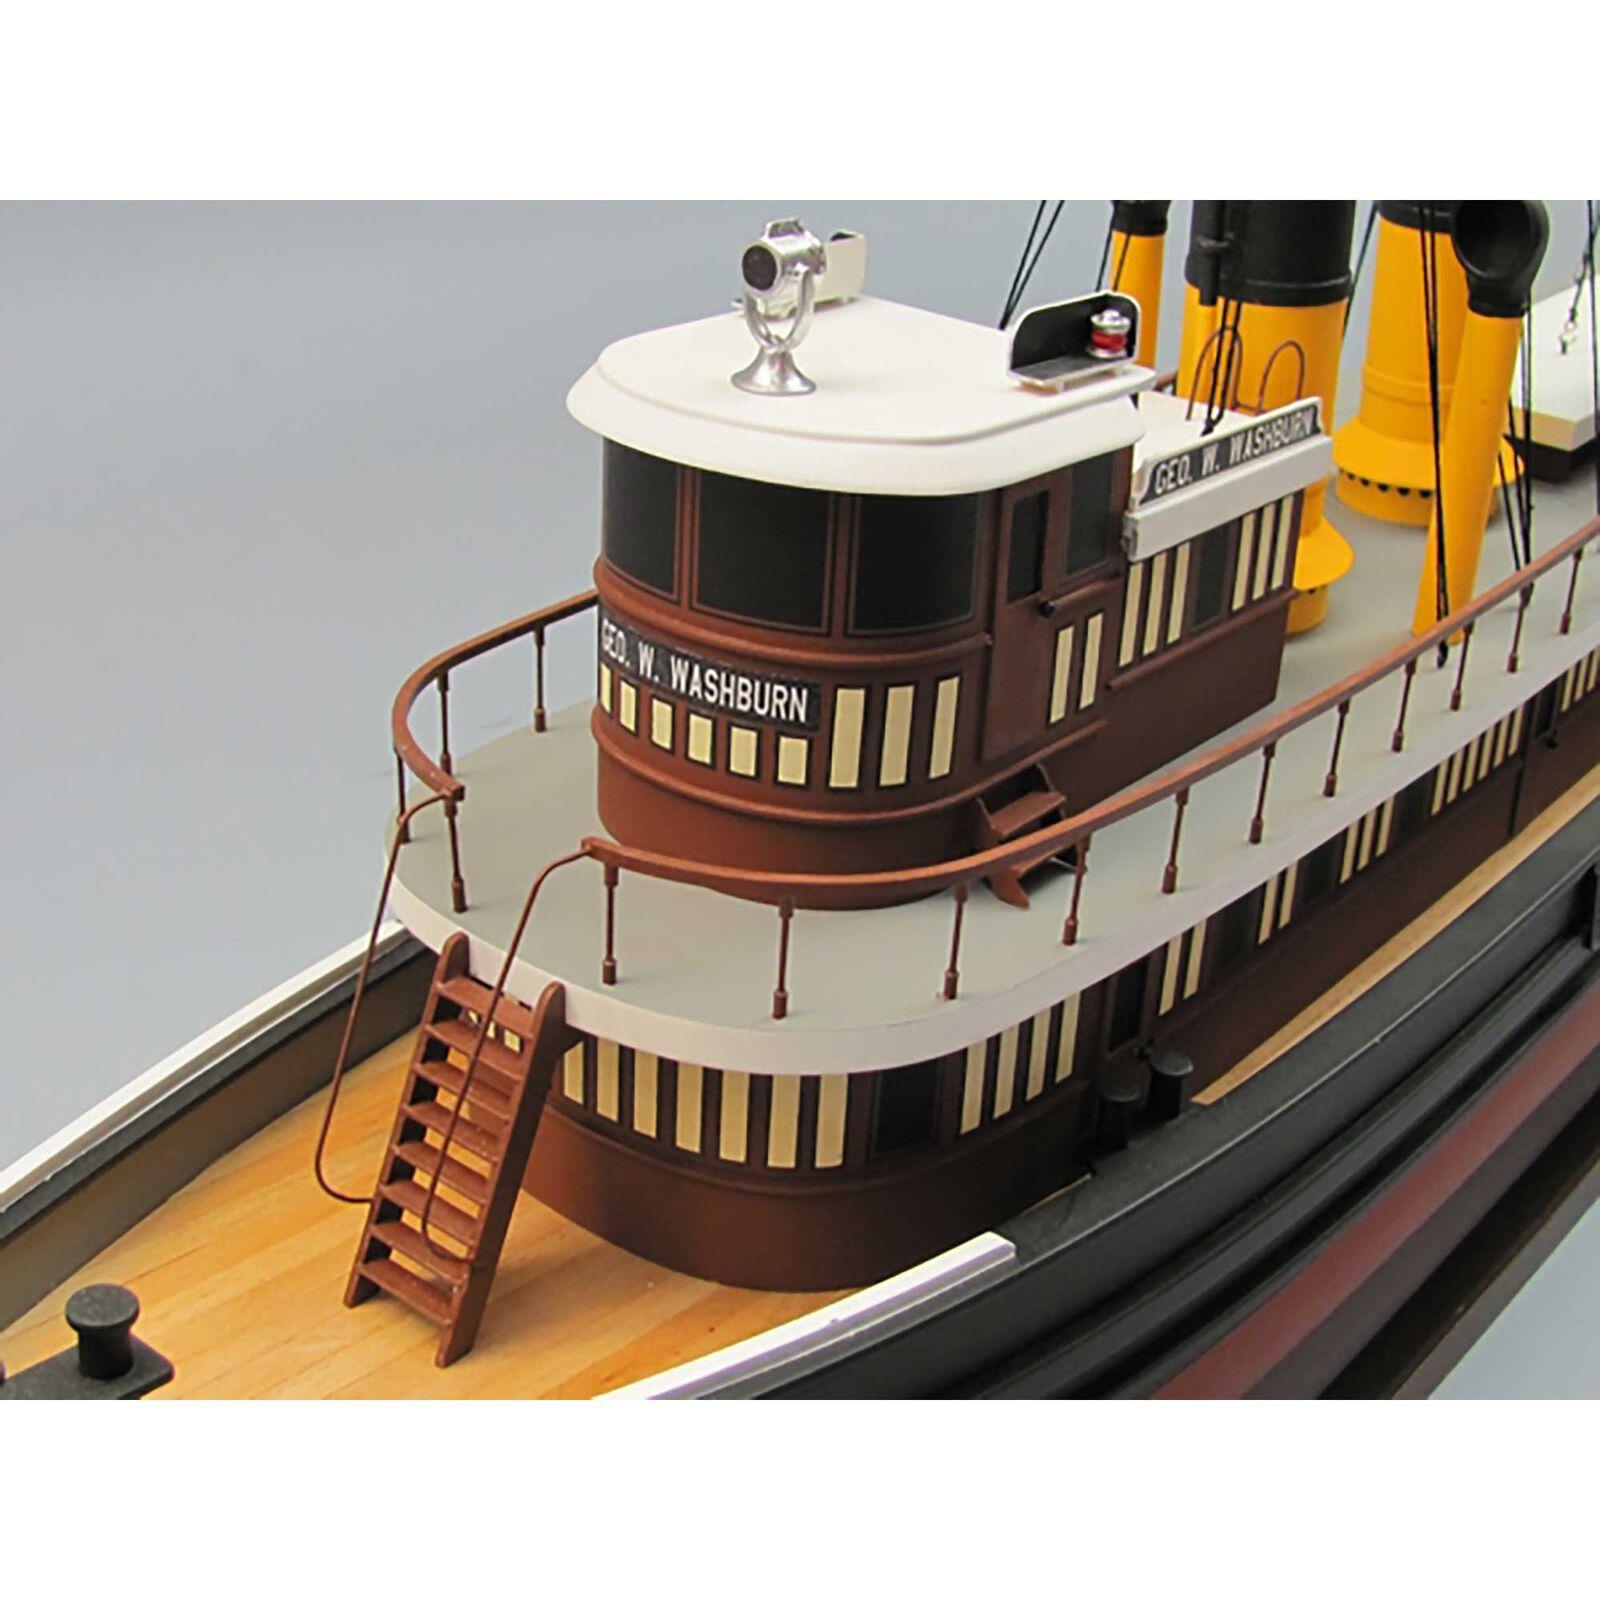 "1/48 George W. Washburn Tugboat Kit , 30"""